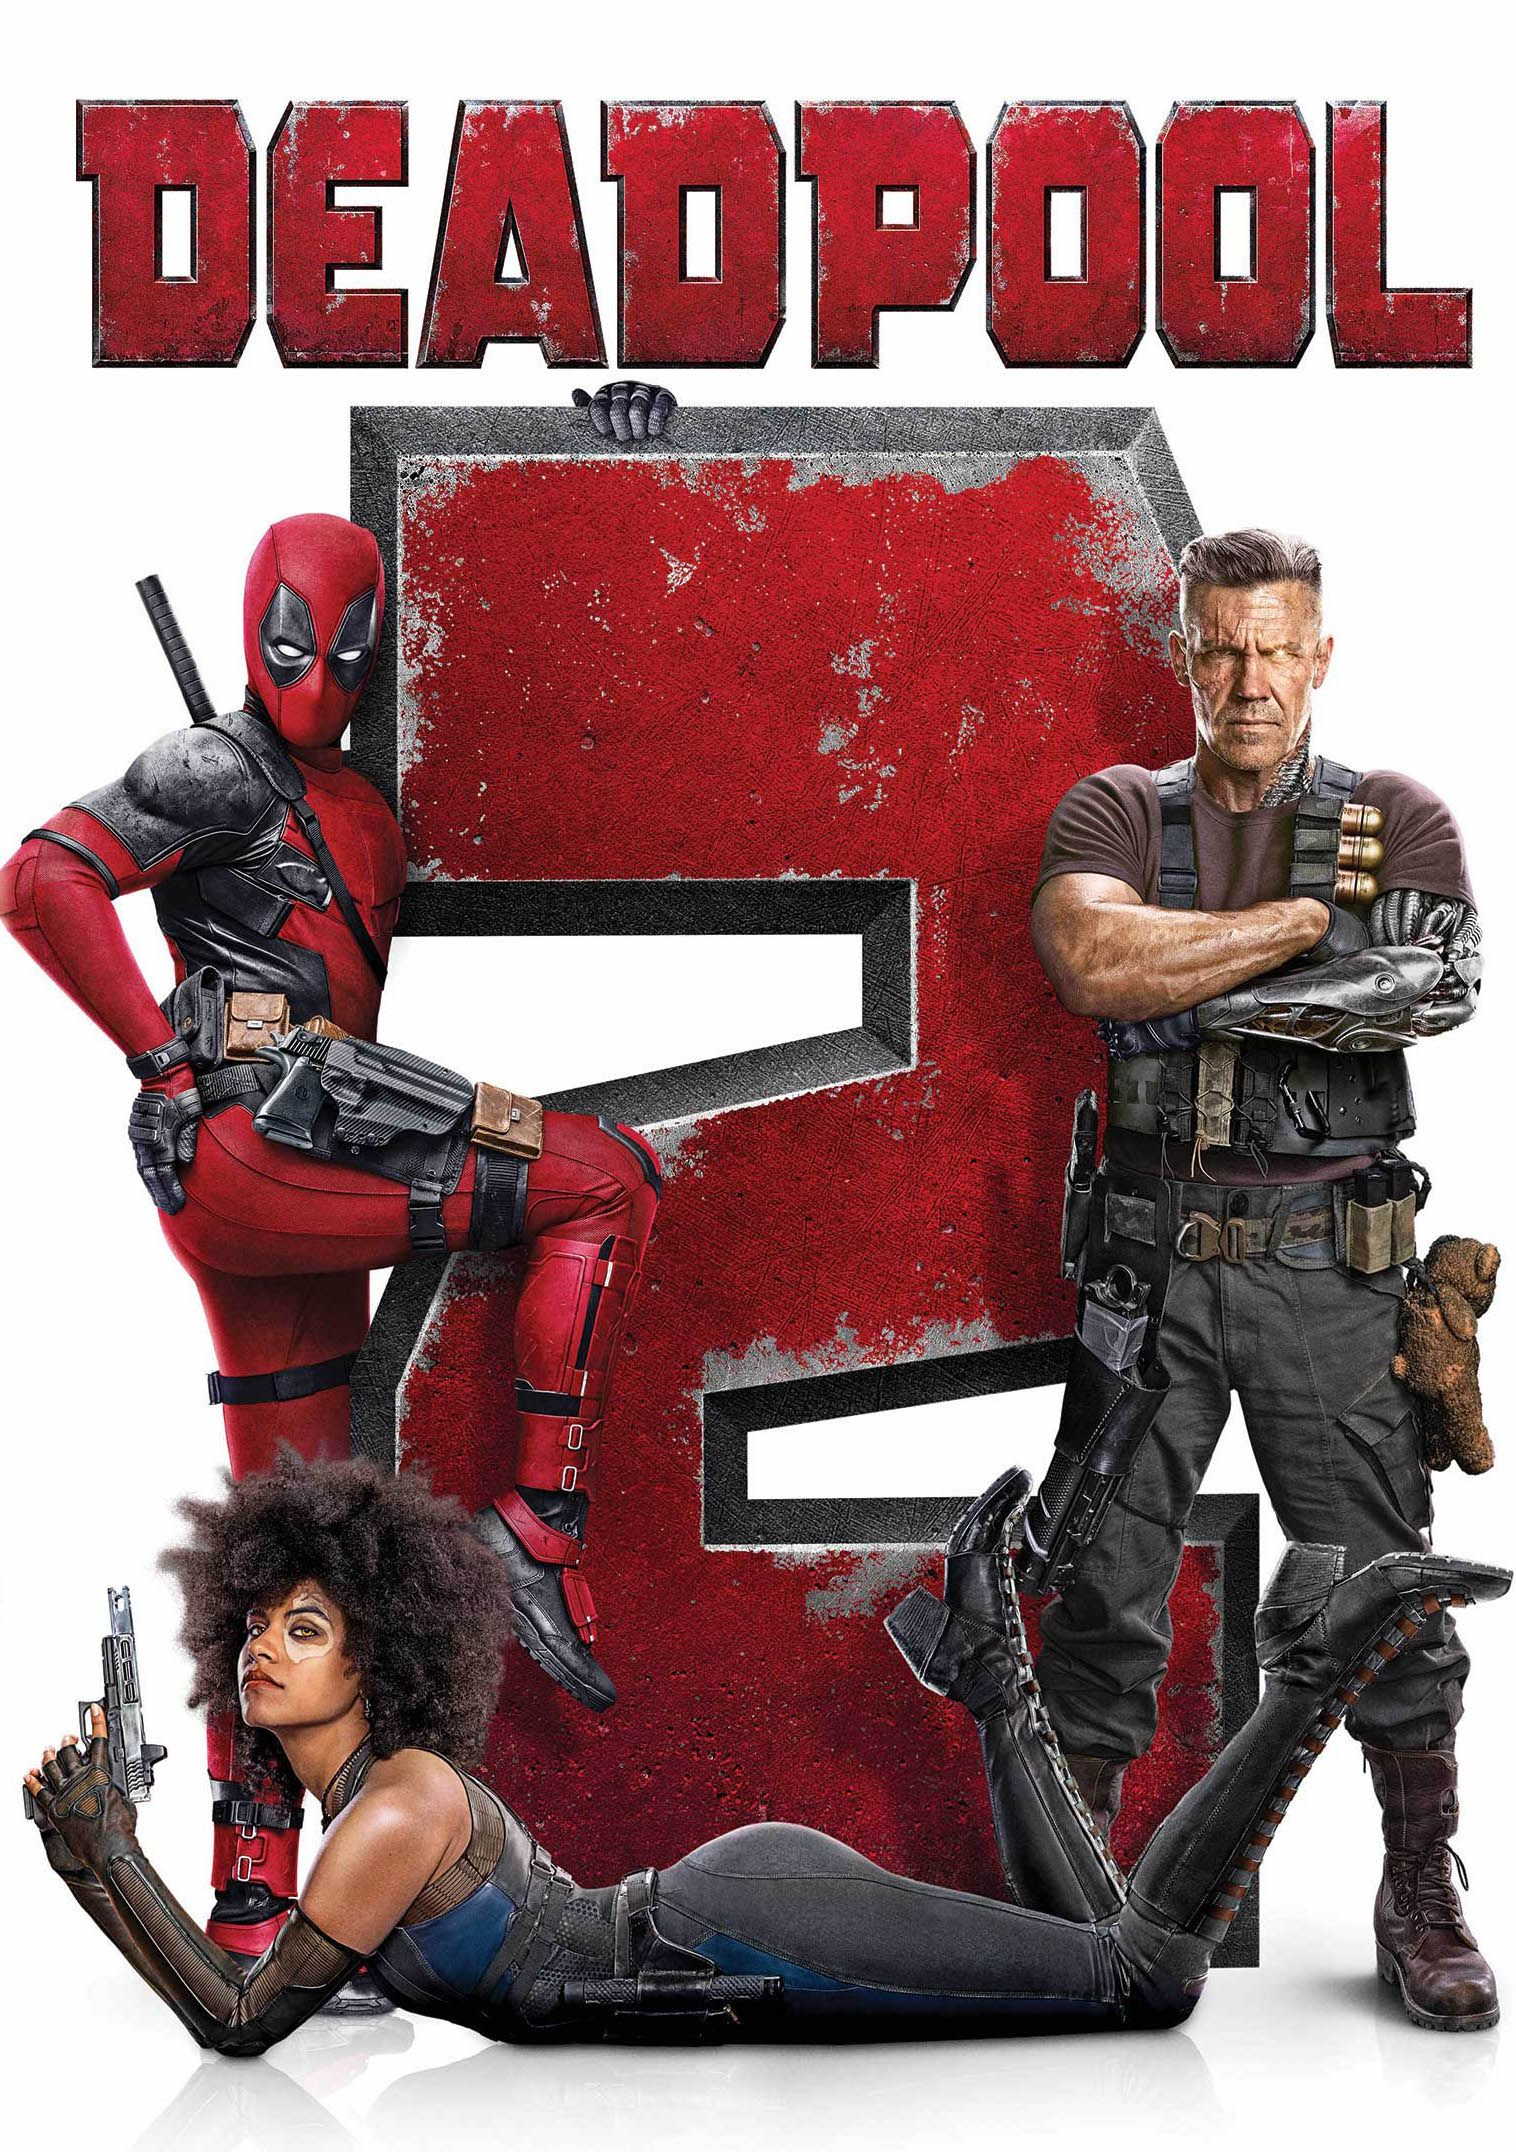 Deadpool 2 Deadpool 2 movie, Deadpool movie, Deadpool